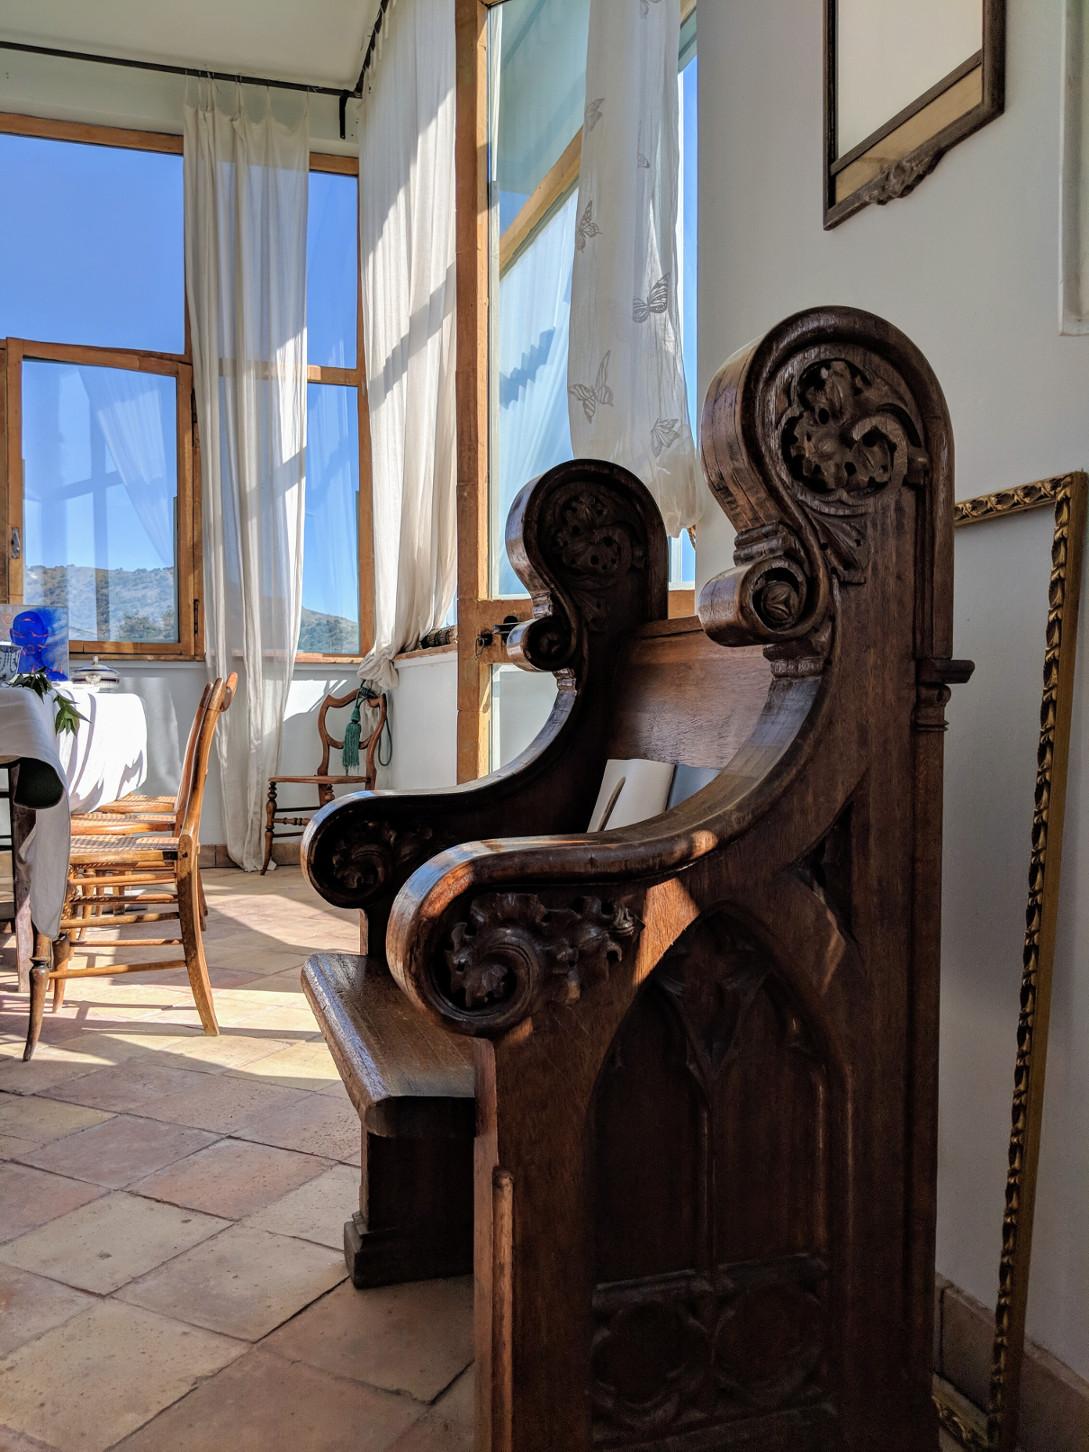 51 gothic chair villa ama sicily.jpg